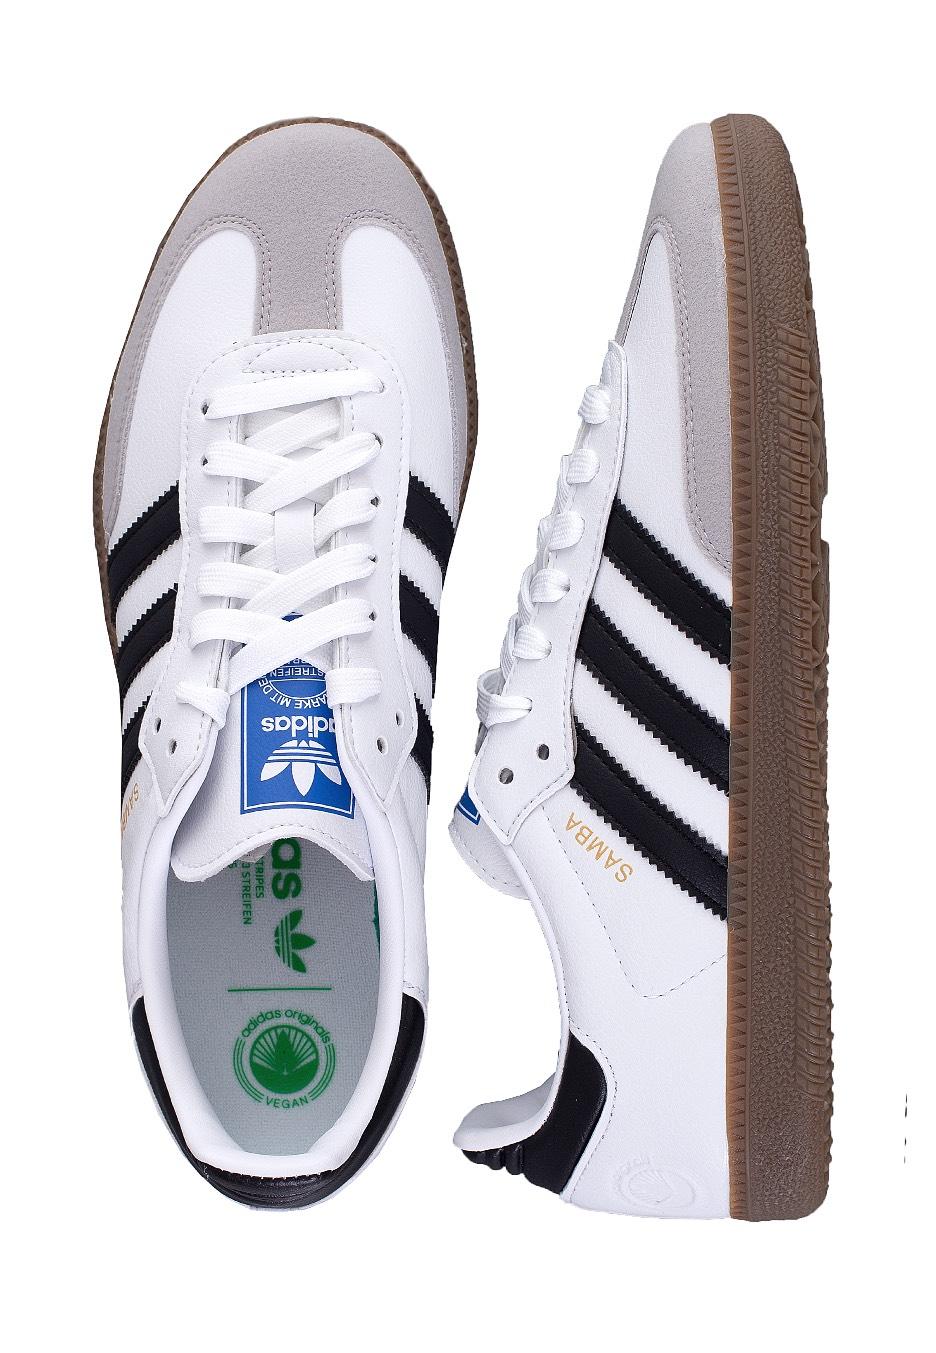 Intervenir litro trampa  Adidas - Samba Vegan FTW White/Core Black/Gum - Girl Shoes - Impericon.com  Worldwide